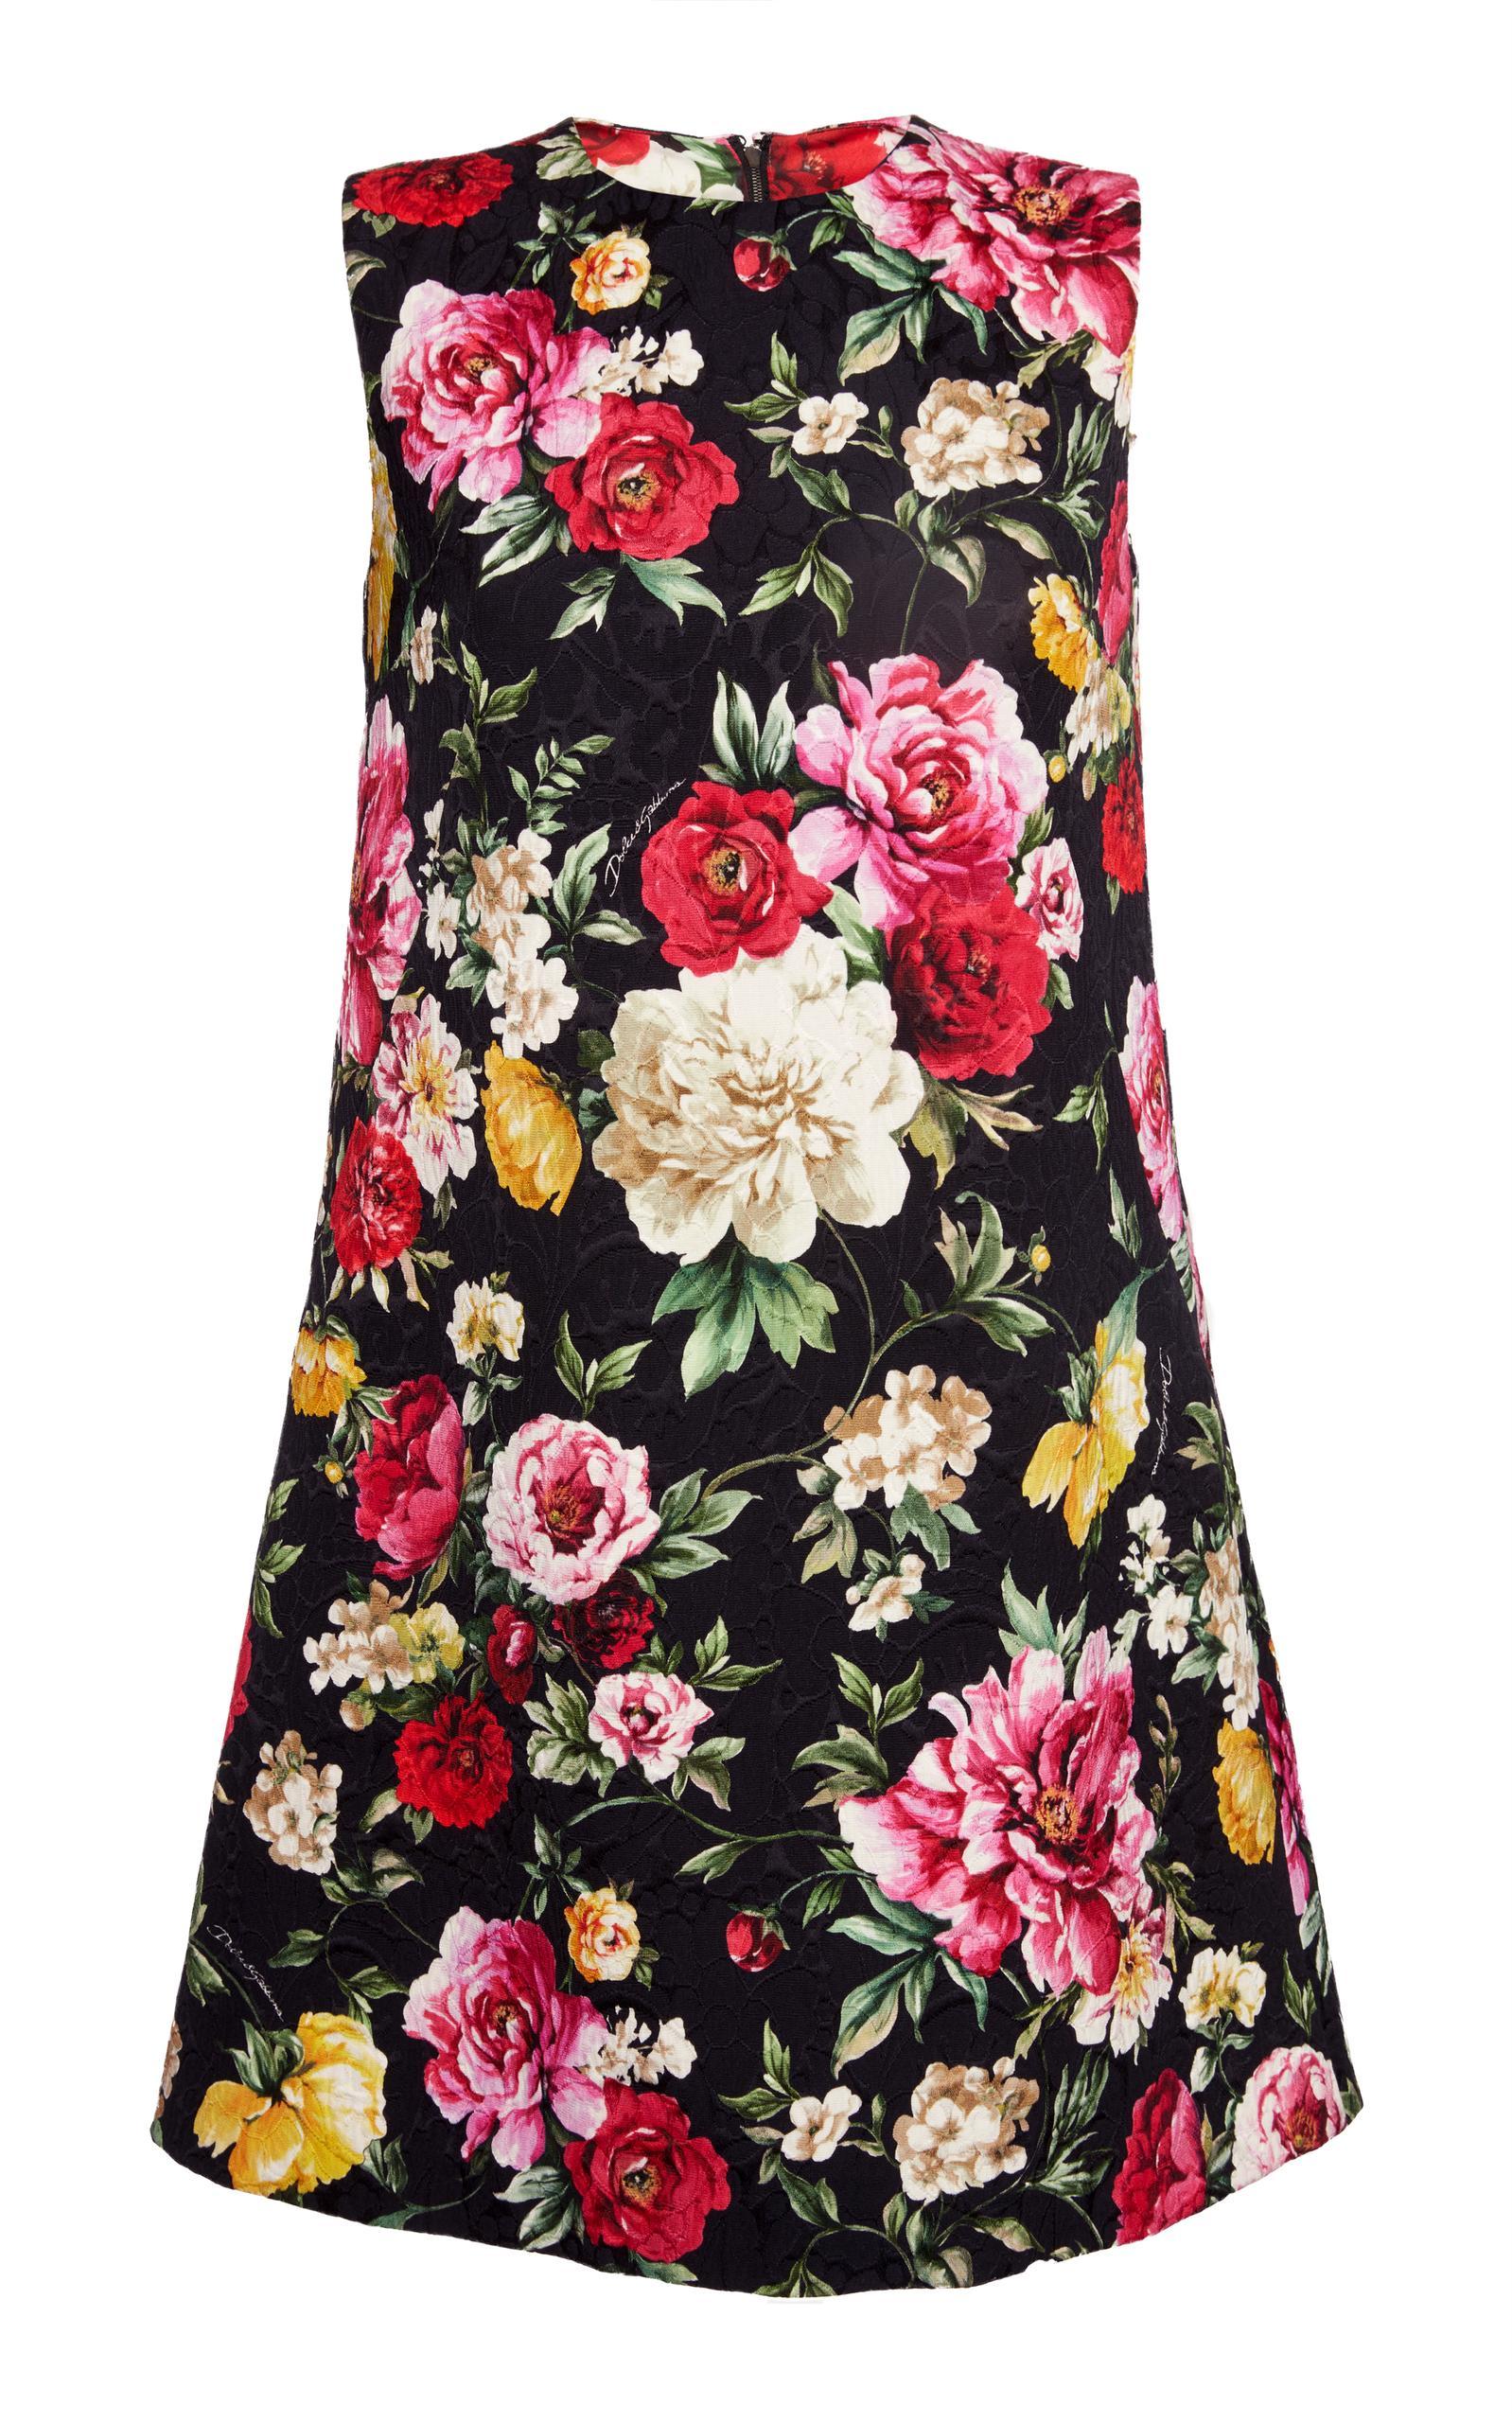 Dolce & Gabbana Rose Print Shift Dress In Floral